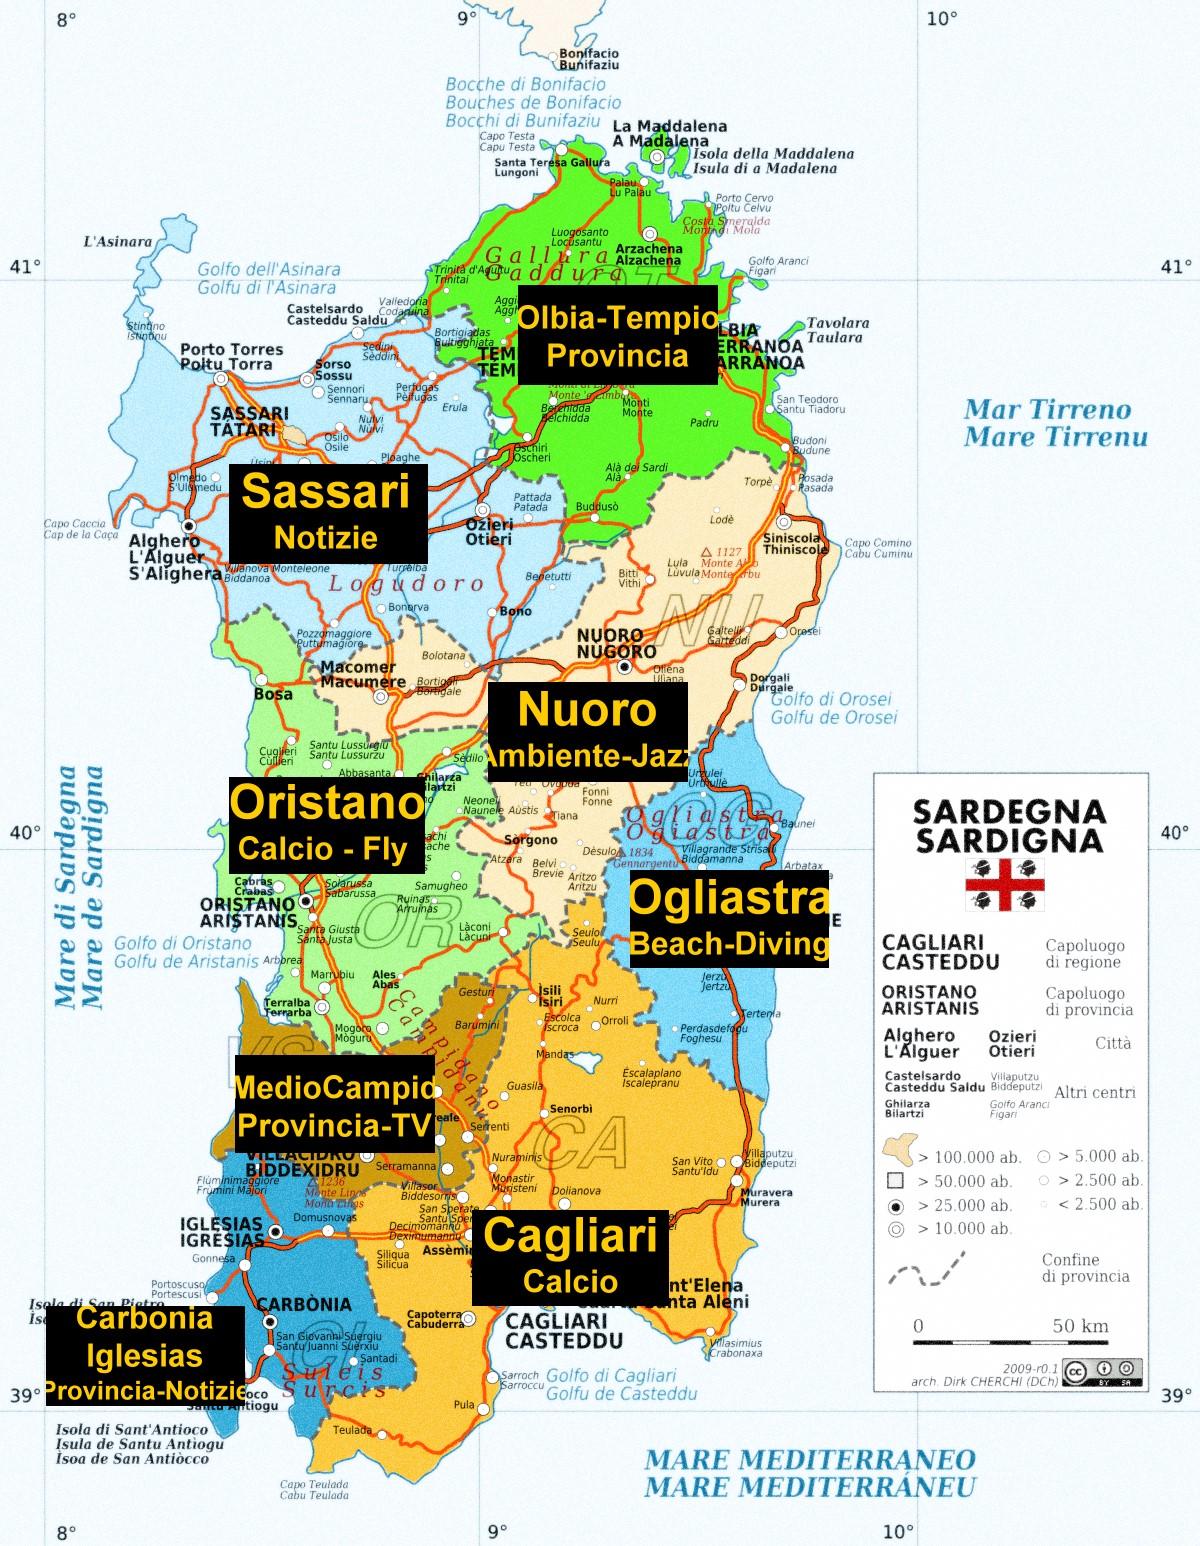 Cartina Sardegna Province.Le 62 Sindache Attualmente In Carica In Sardegna Resoconto Di Daniela Domenici Daniela E Dintorni